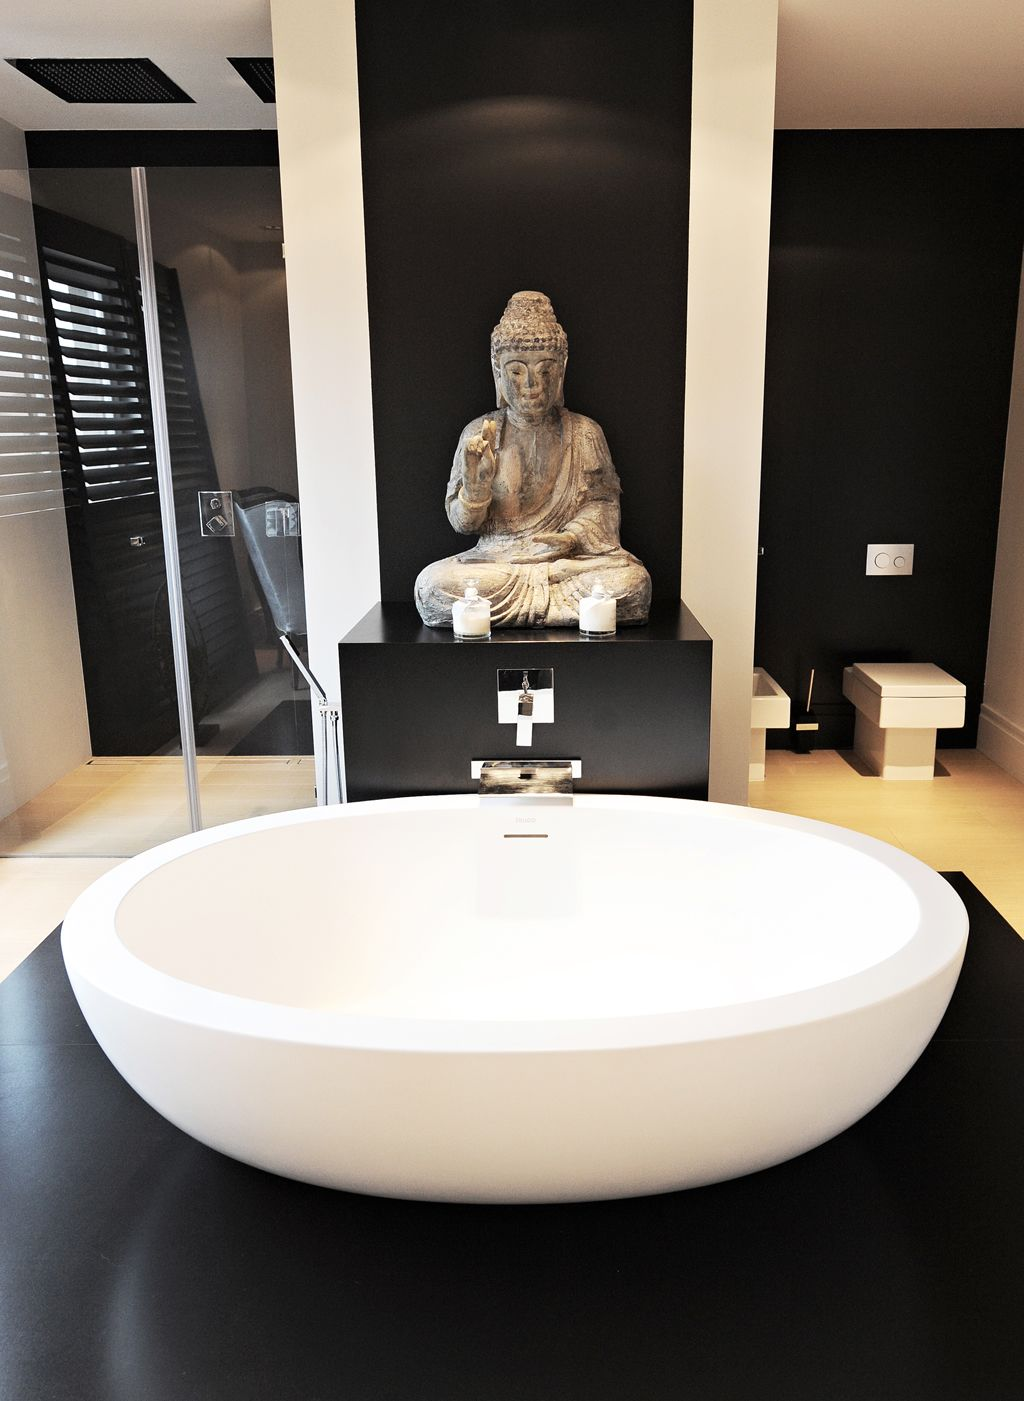 Aleksandra Miecznicka Black White Buddha Decor Home Elegant Interior Design